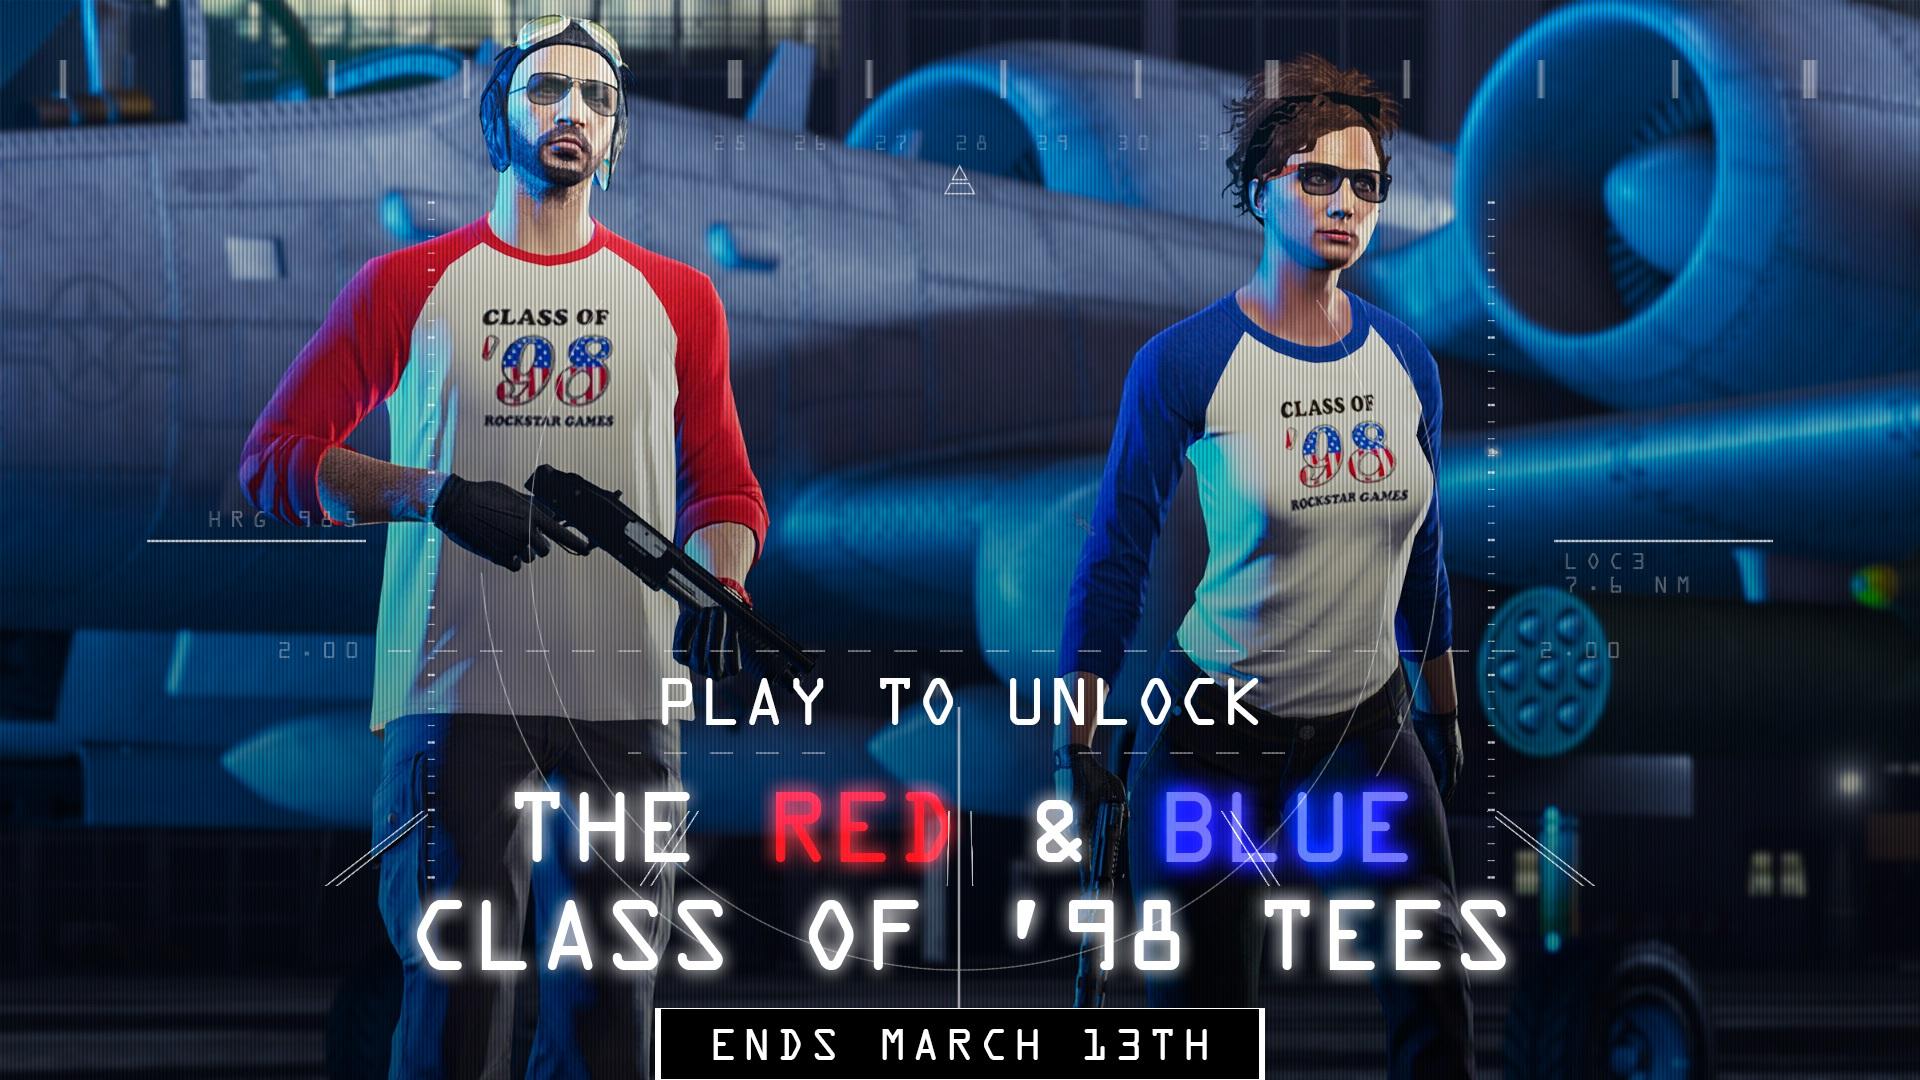 class-of-98